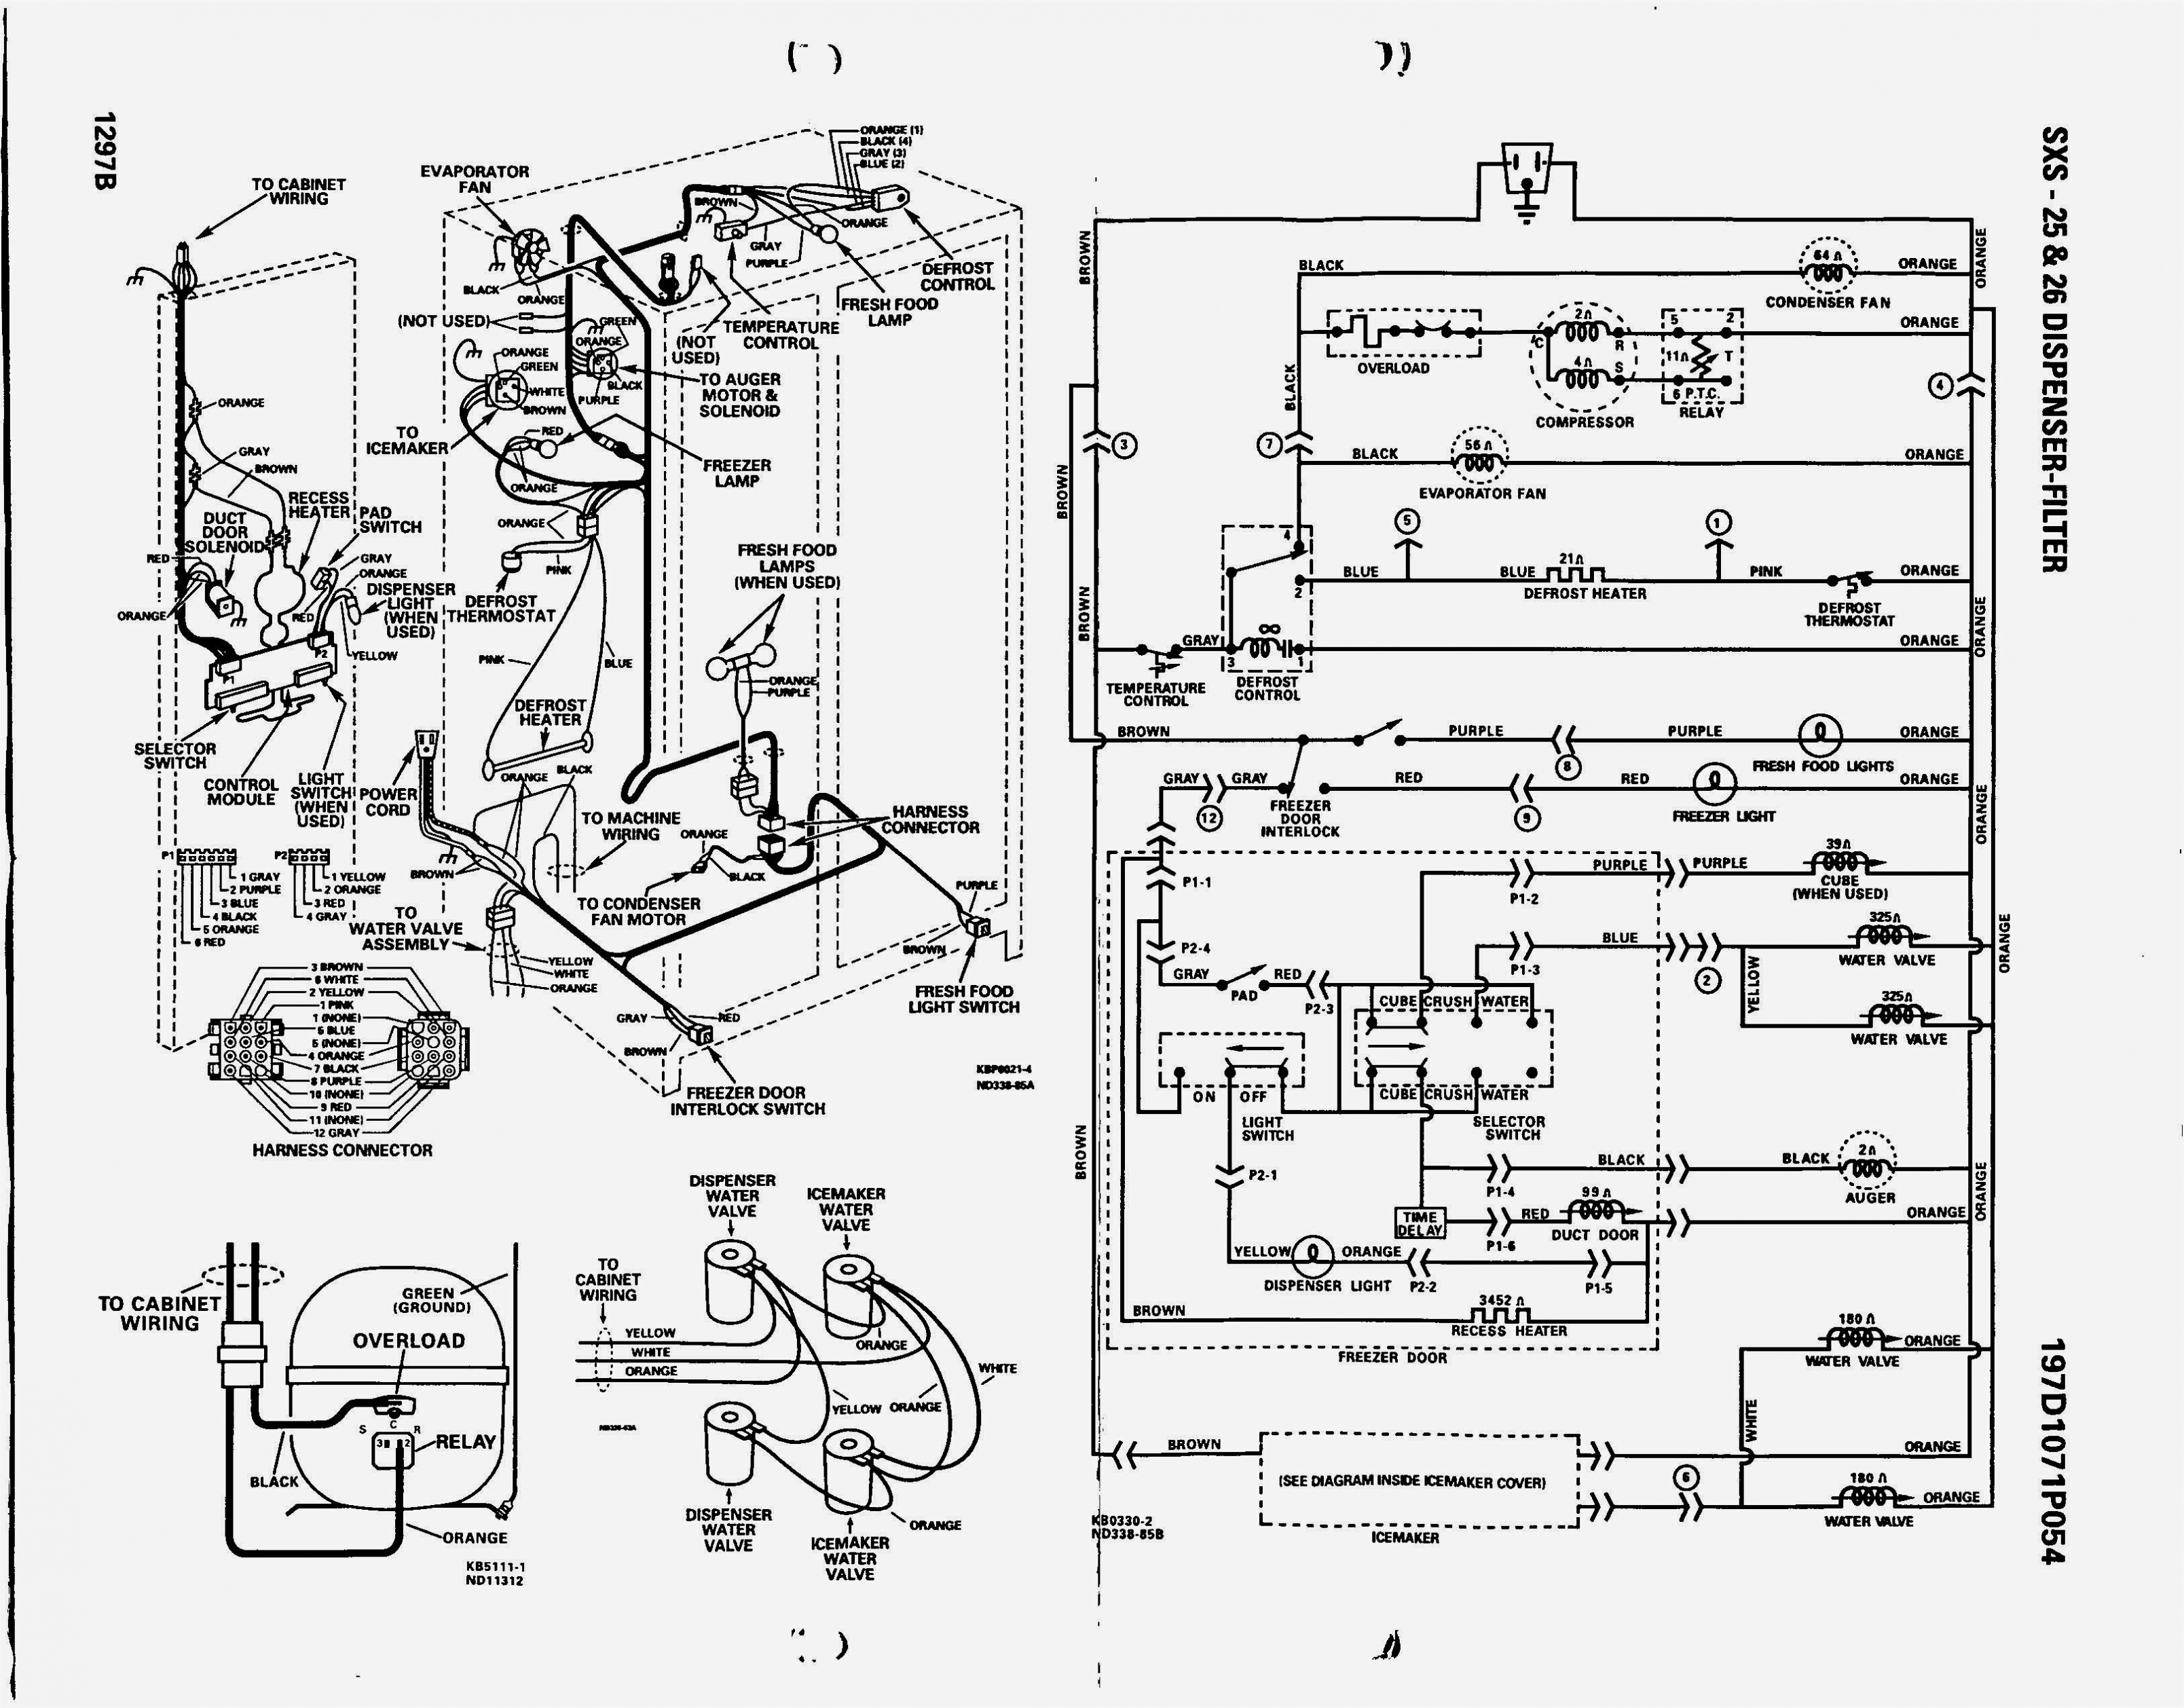 Well Pump Wiring Schematic | Wiring Library - 3 Wire Submersible Pump Wiring Diagram